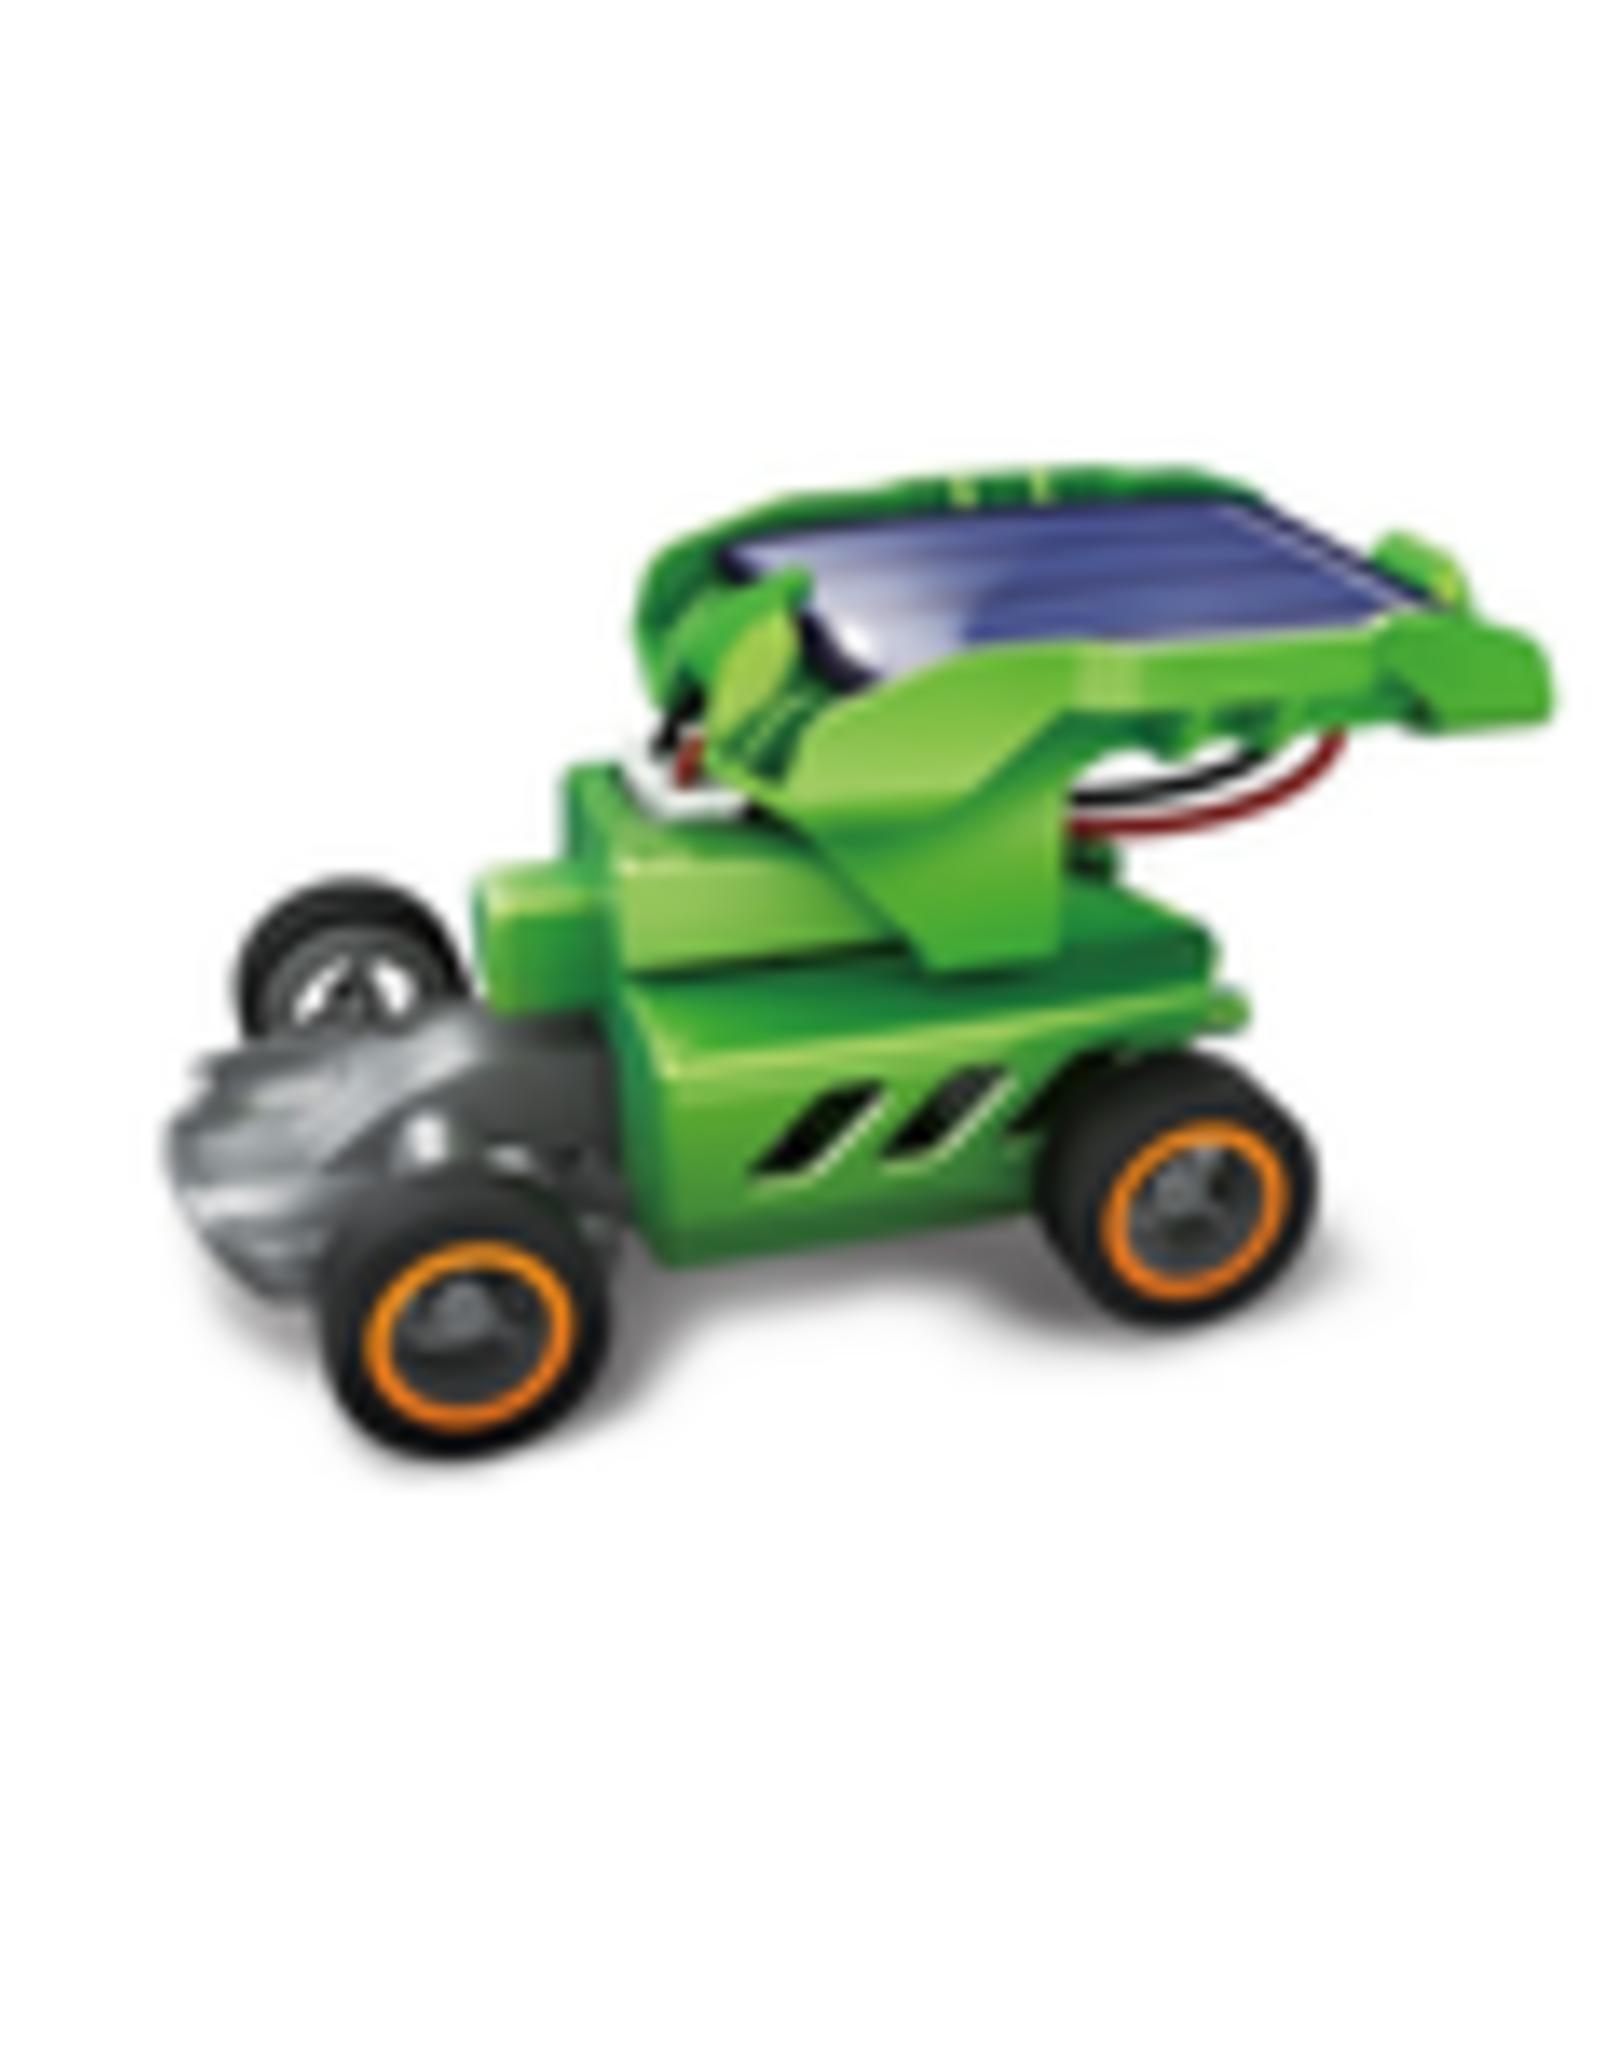 Elenco Elenco 7-in-1 Solar Rechargeable Solar Transformers